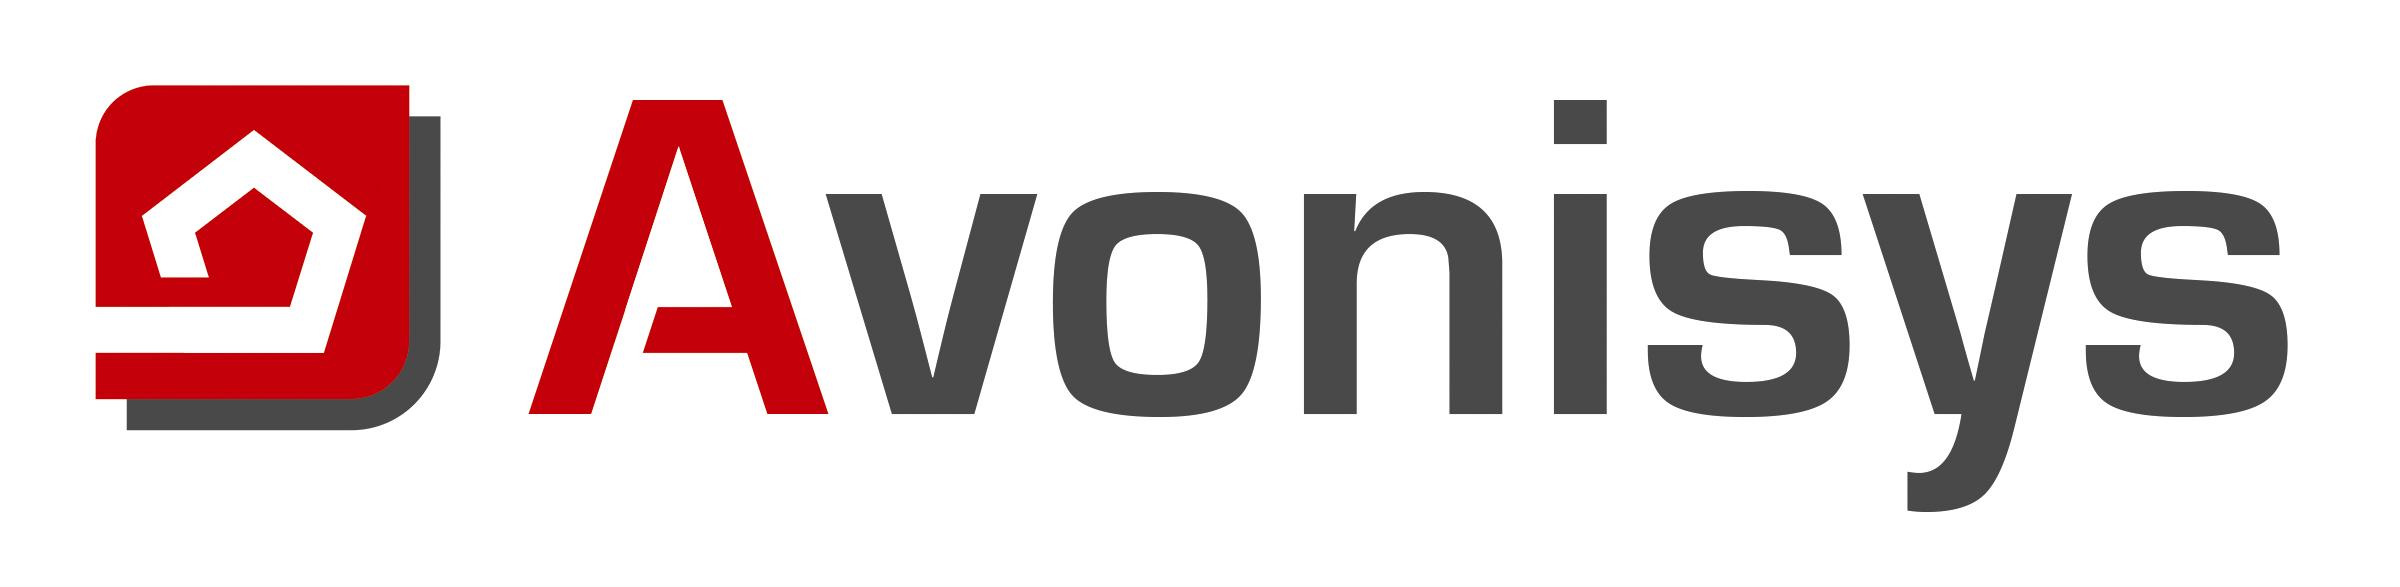 Avonisys AG wins patent litigation case against Synova SA